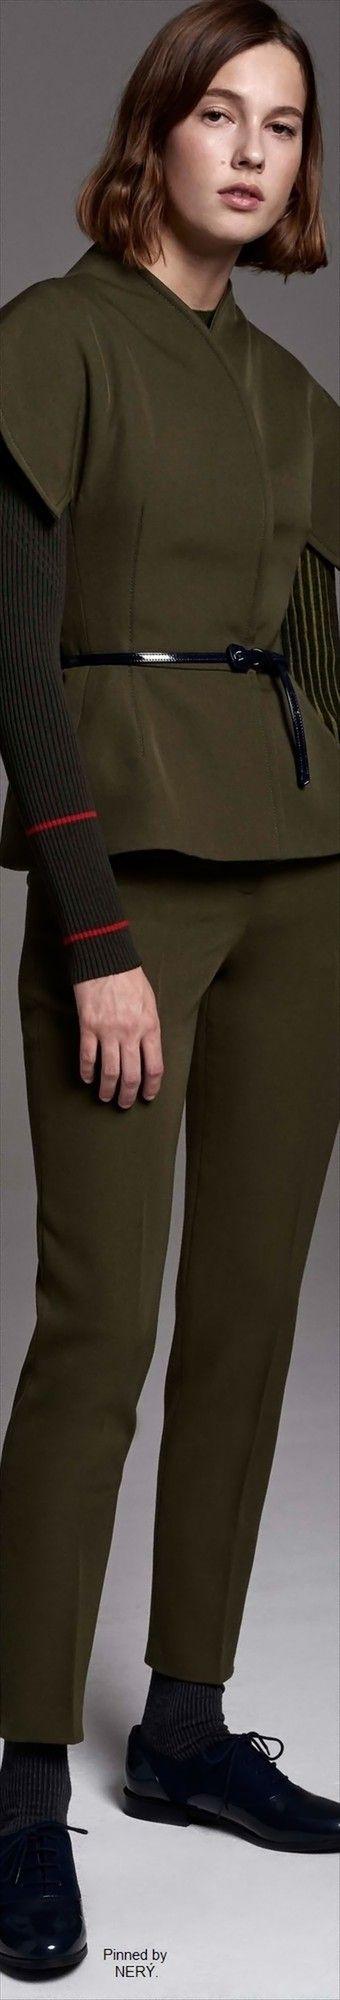 Carolina Herrera Pre-Fall 2017  Kind of looks like a Jedi outfit.